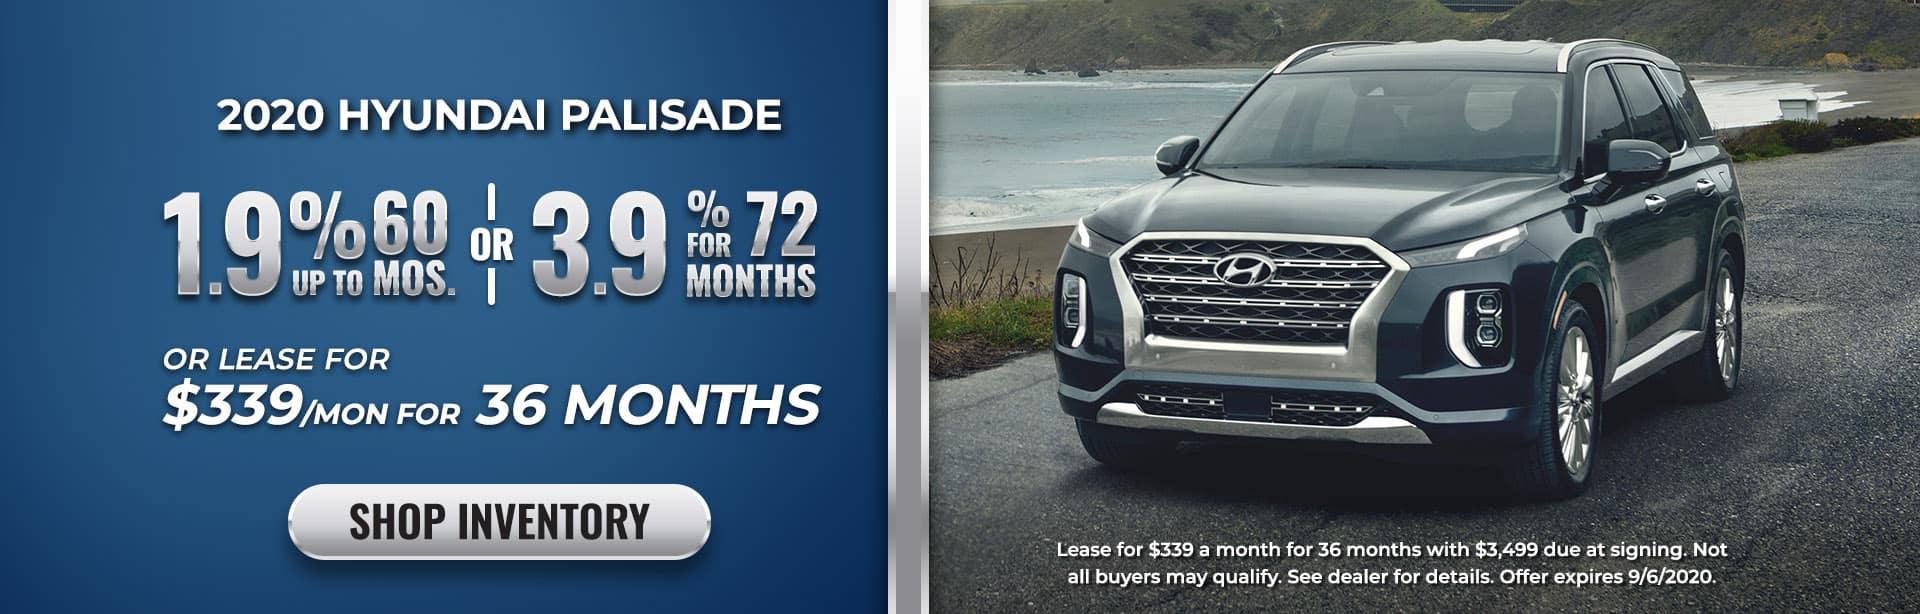 Lease of finance 2020 Palisade at Ed Voyles Hyundai of Smyrna, GA